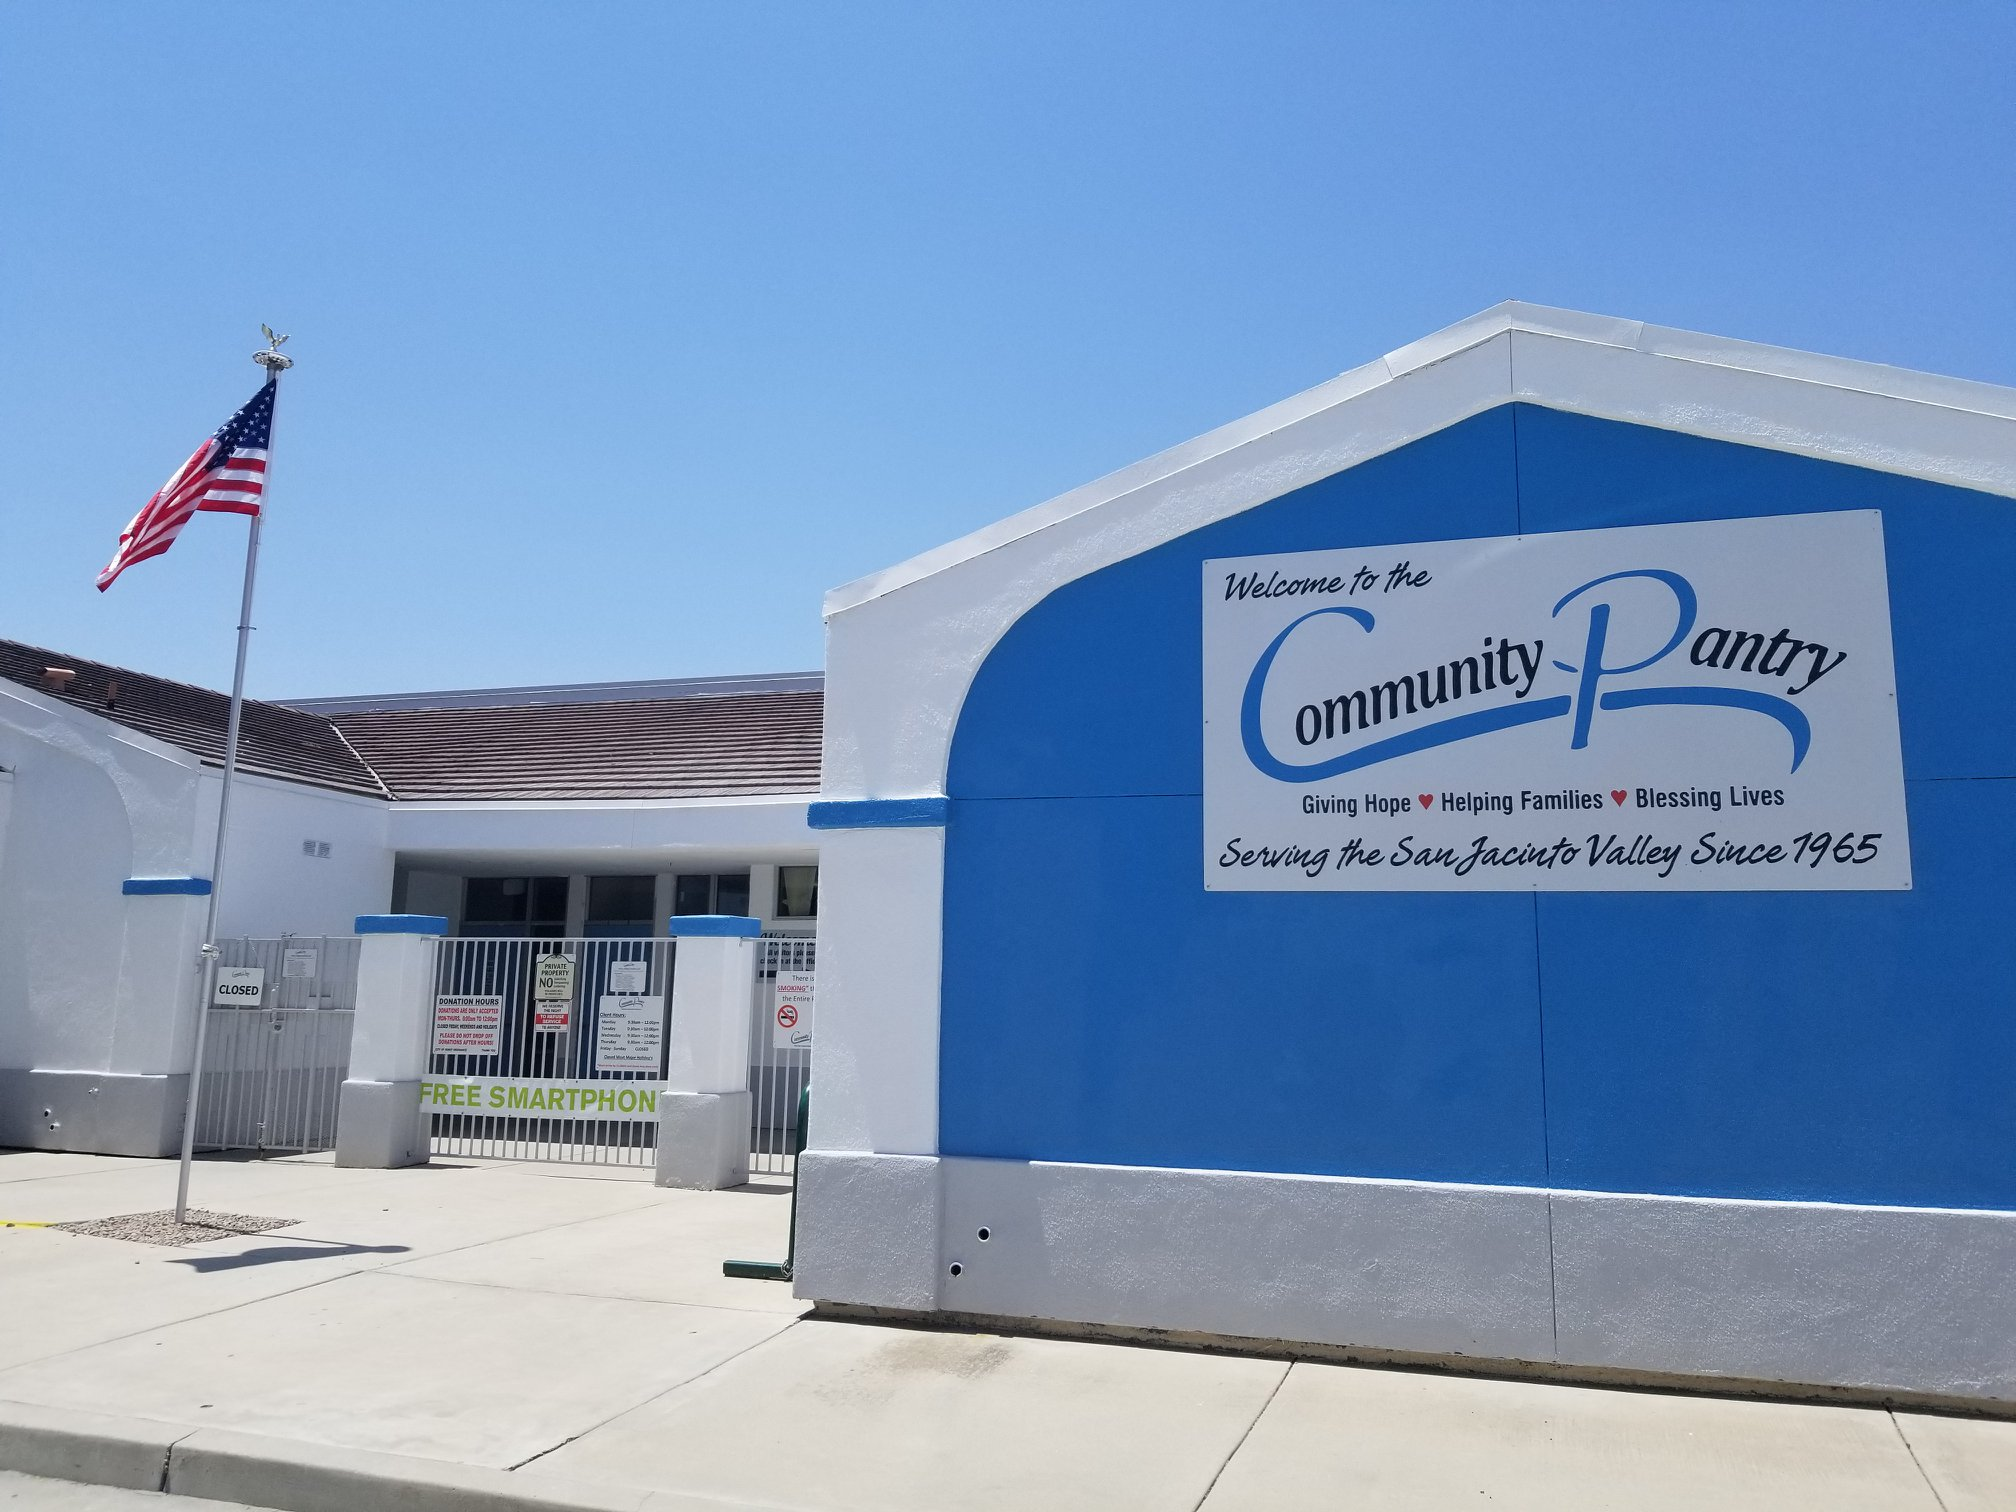 Valley Community Pantry